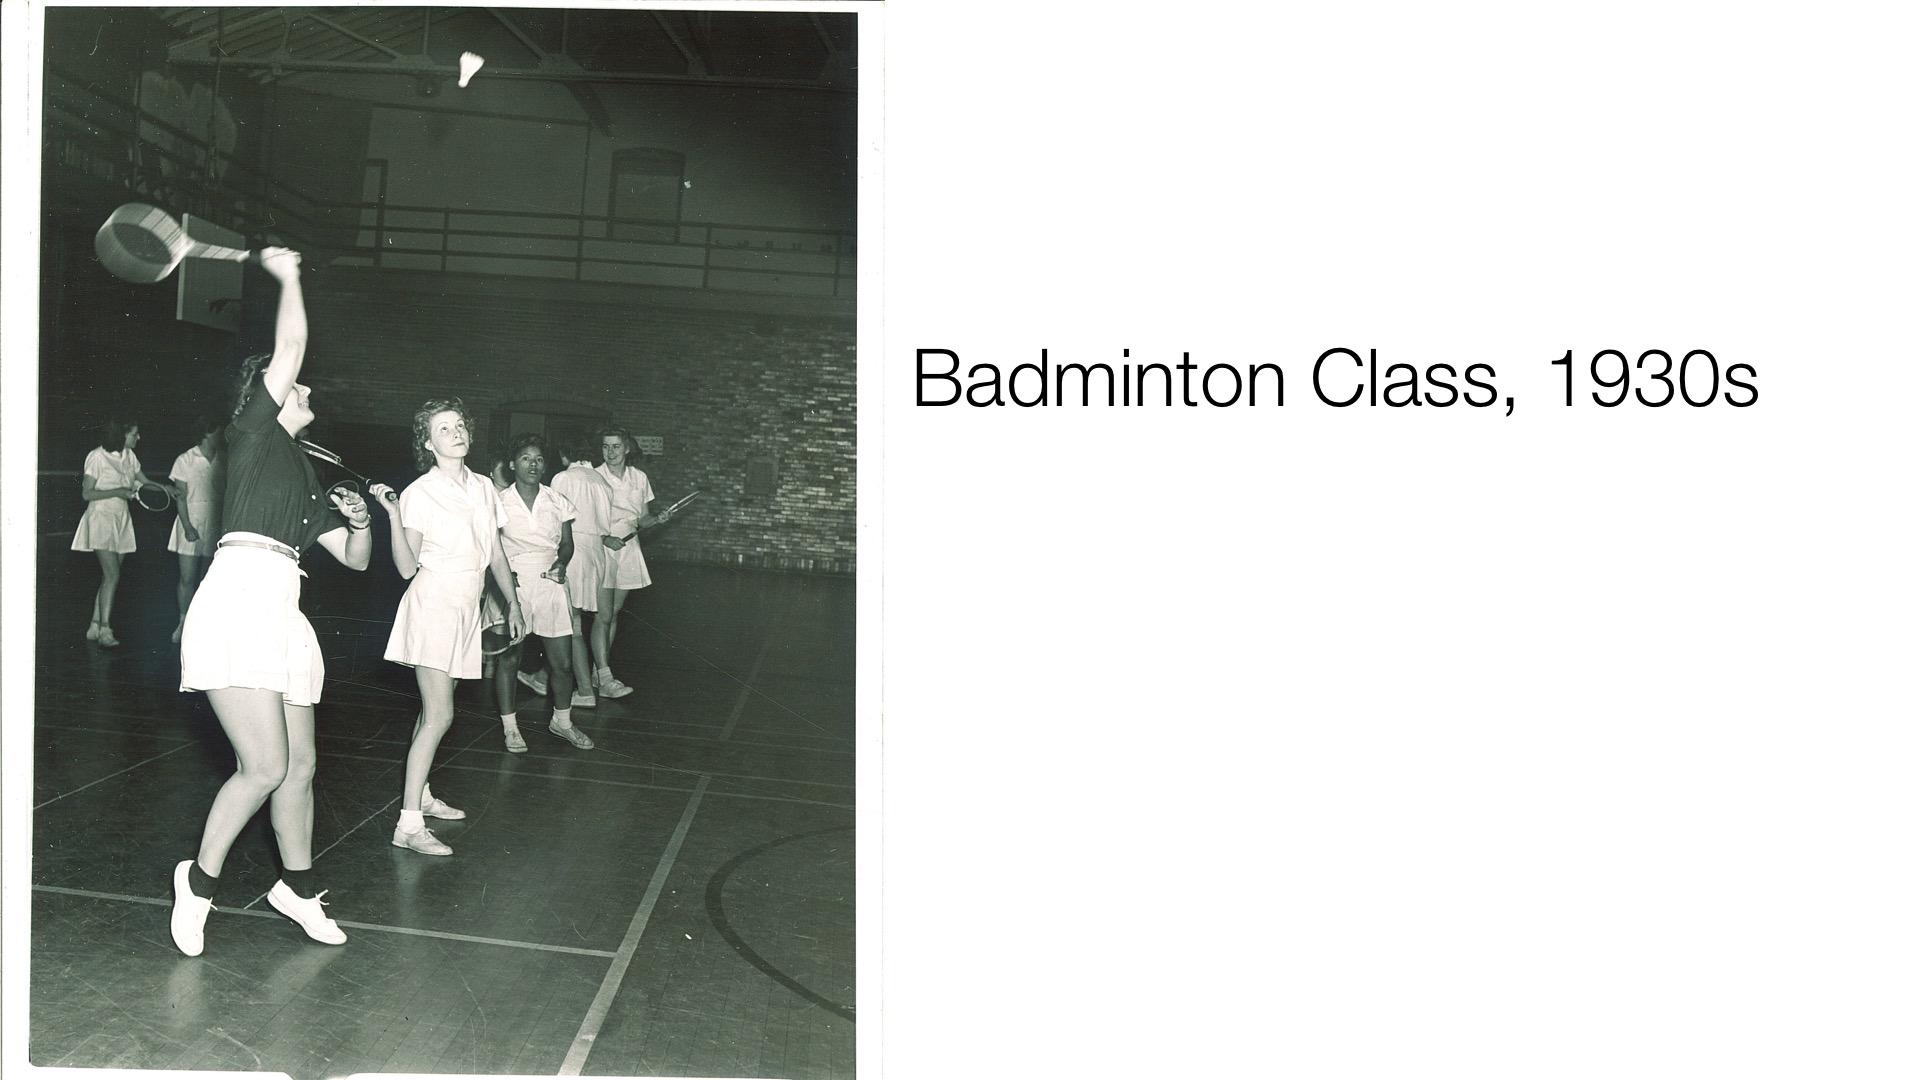 badminton class, 1930s